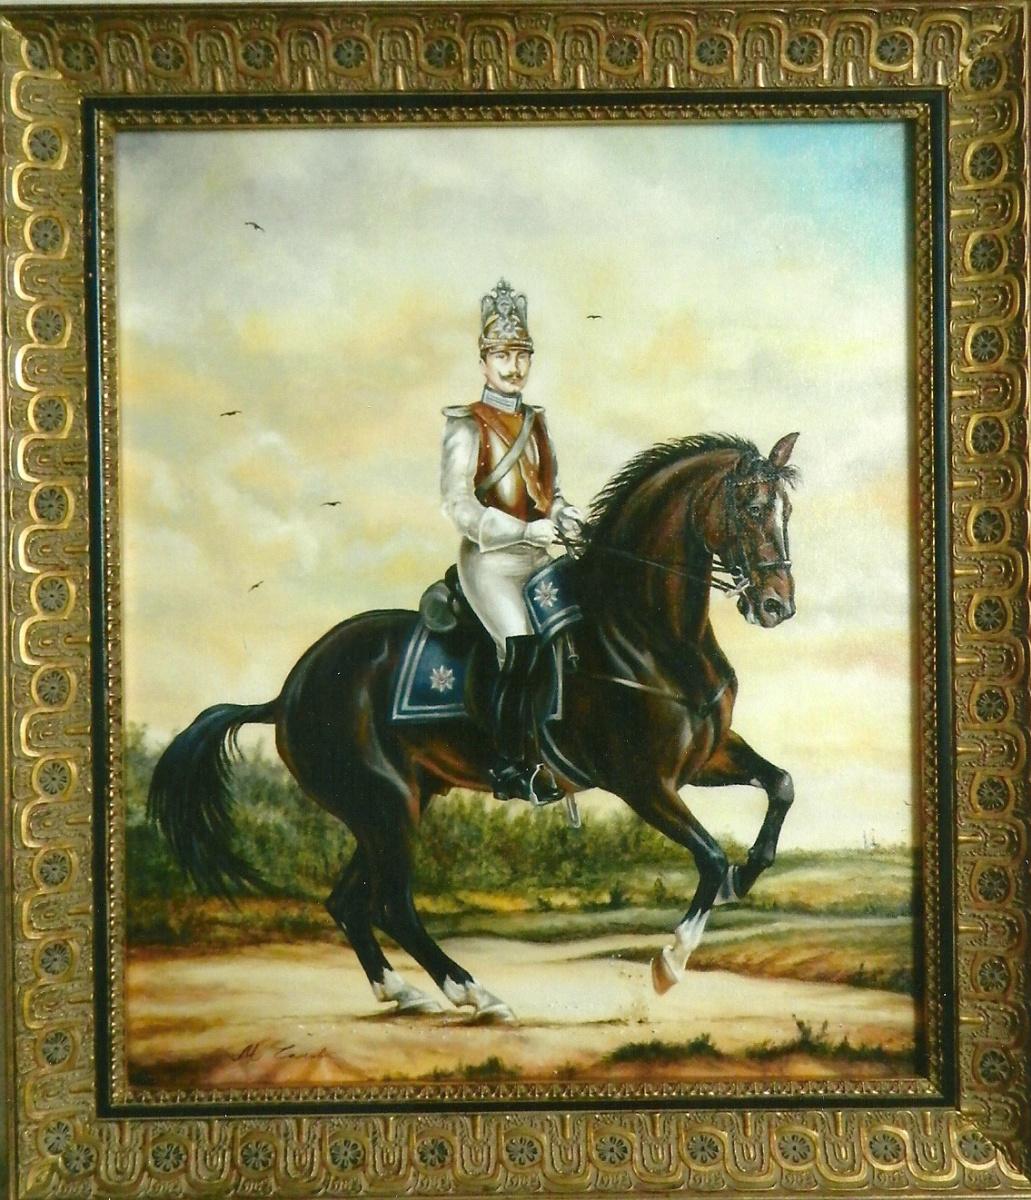 Маргарита Анатольевна Чакова. Aubert - Officer of the Life Guard Guard of the Cuirassier Regiment of 1846-1853.